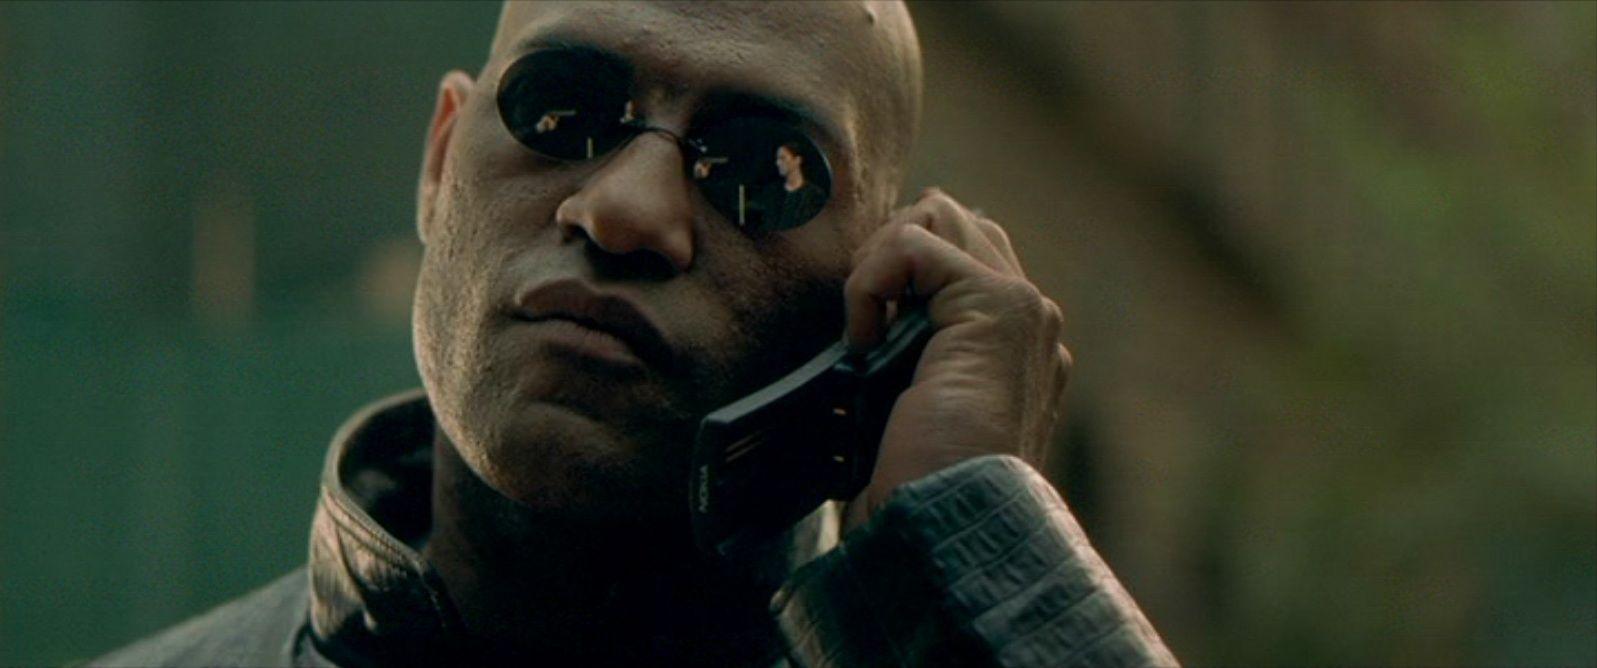 Image result for matrix phone